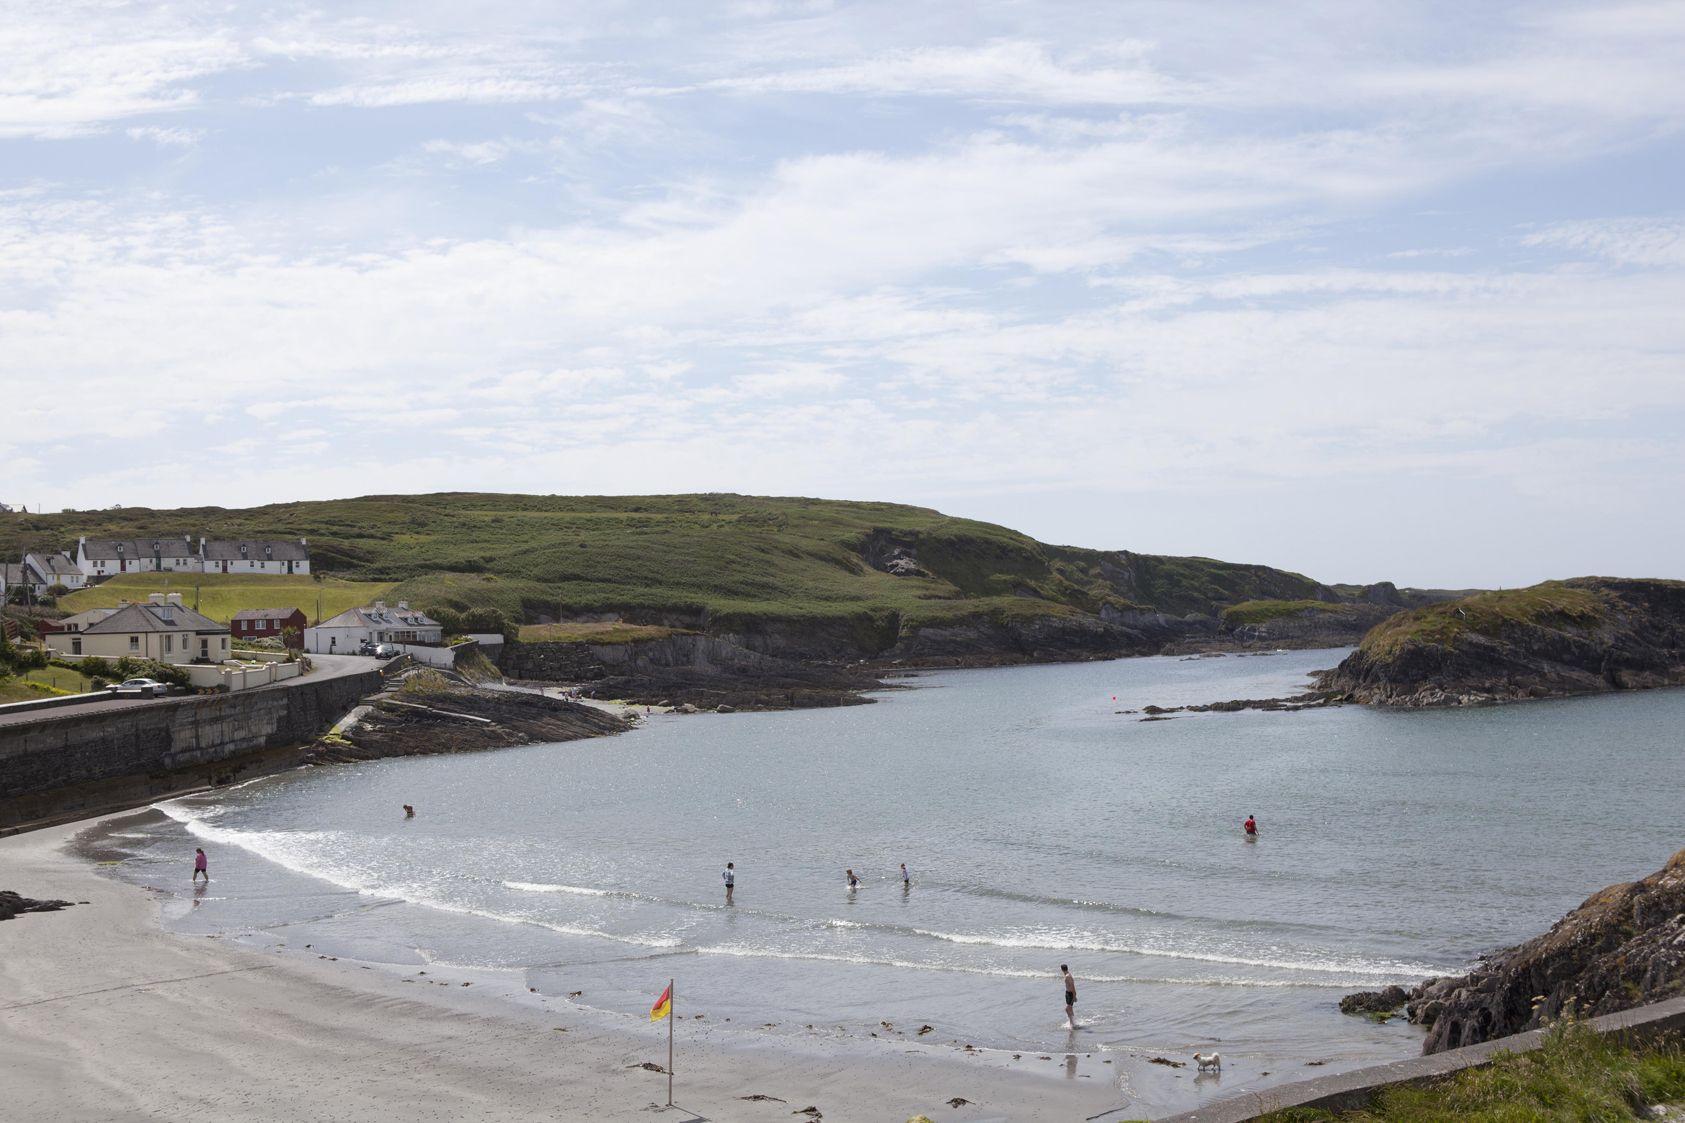 Tragumna beach: bathers advised not to swim until further notice